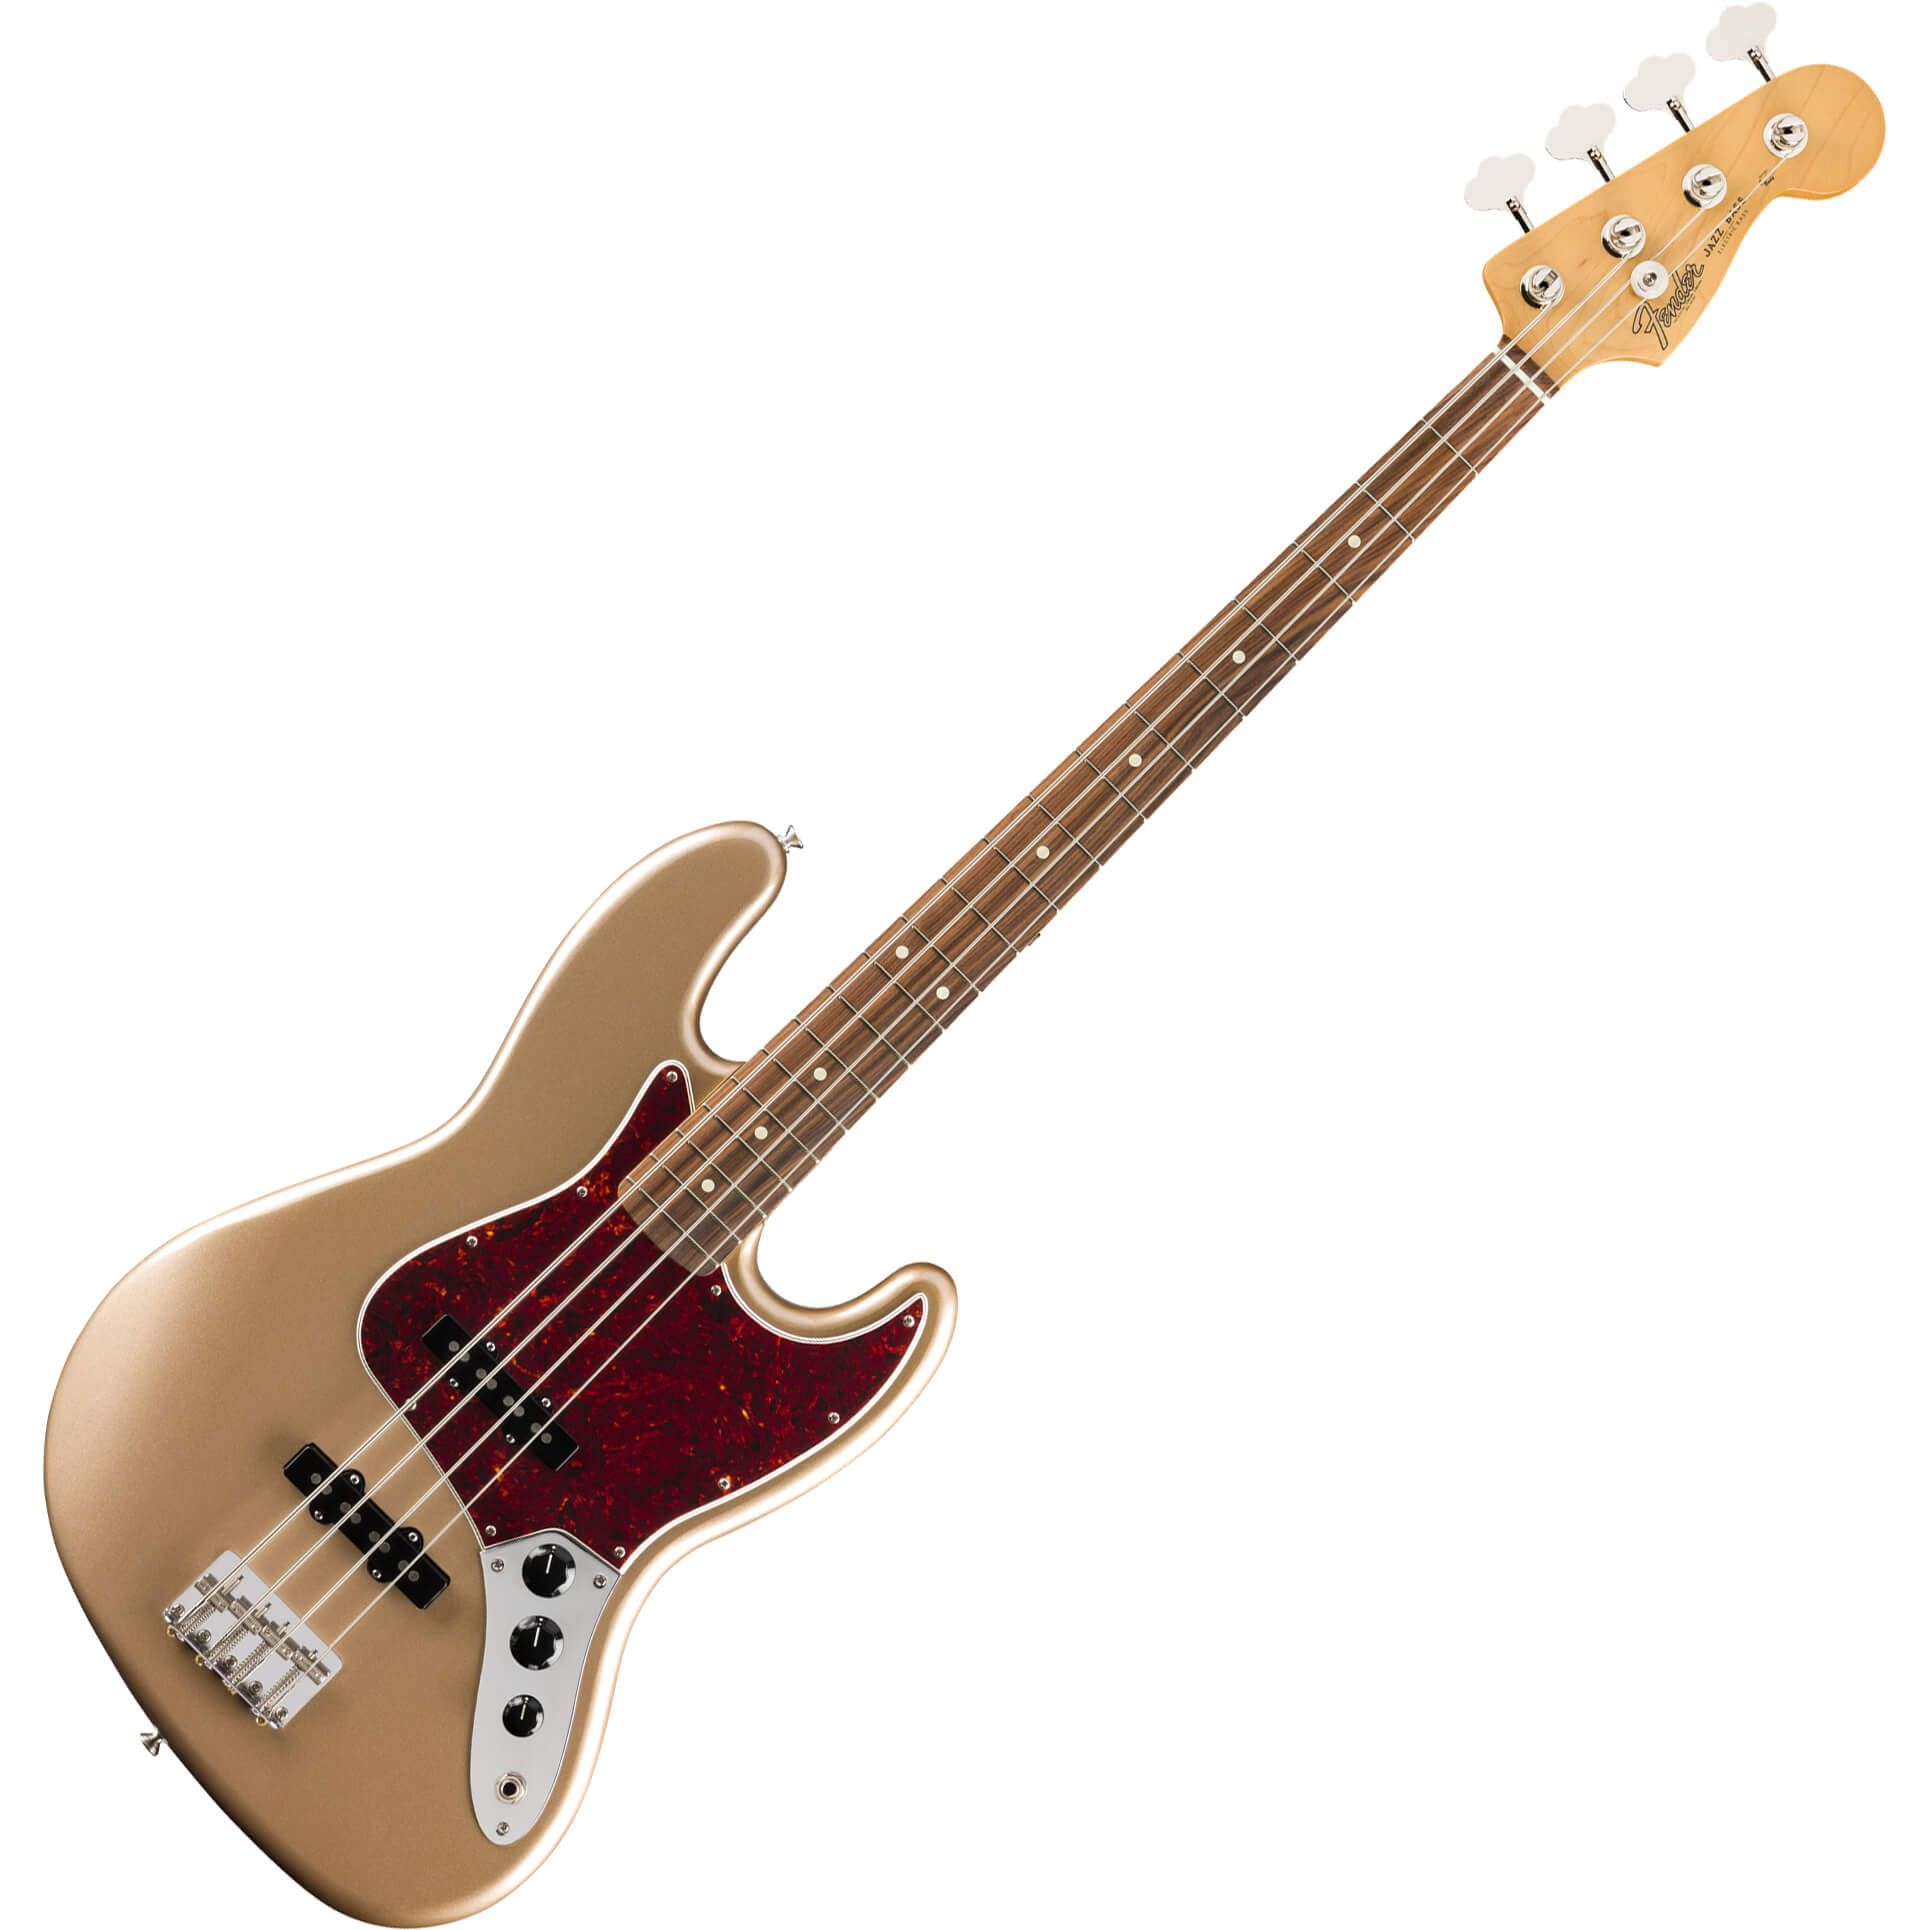 Fender Vintera Series 60s Jazz Bass - PF - Firemist Gold